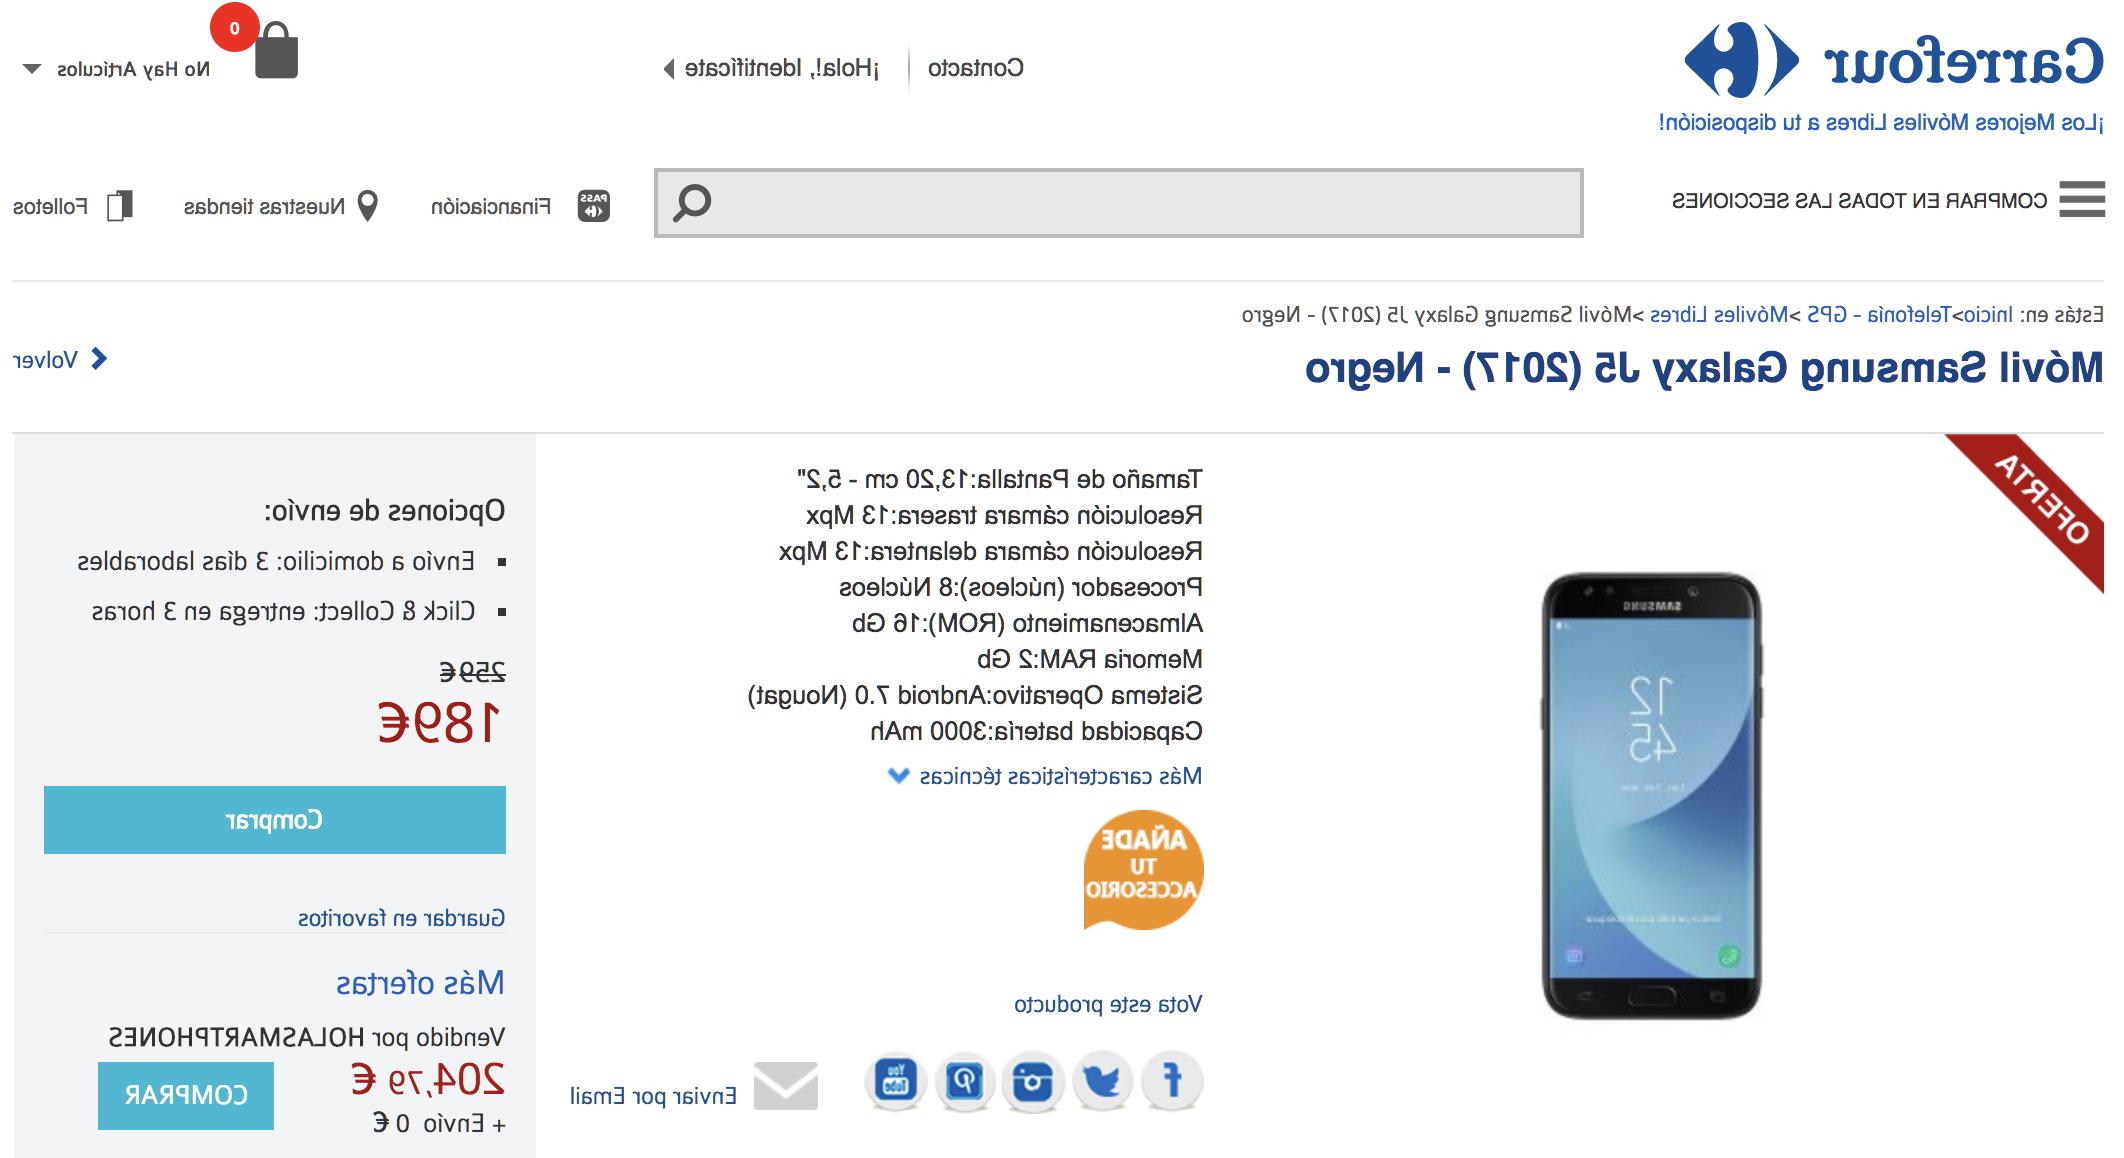 Precio Portatiles Carrefour Gdd0 Los Portà Tiles Mà S Baratos Està N En Carrefour Y Los Smartphones En